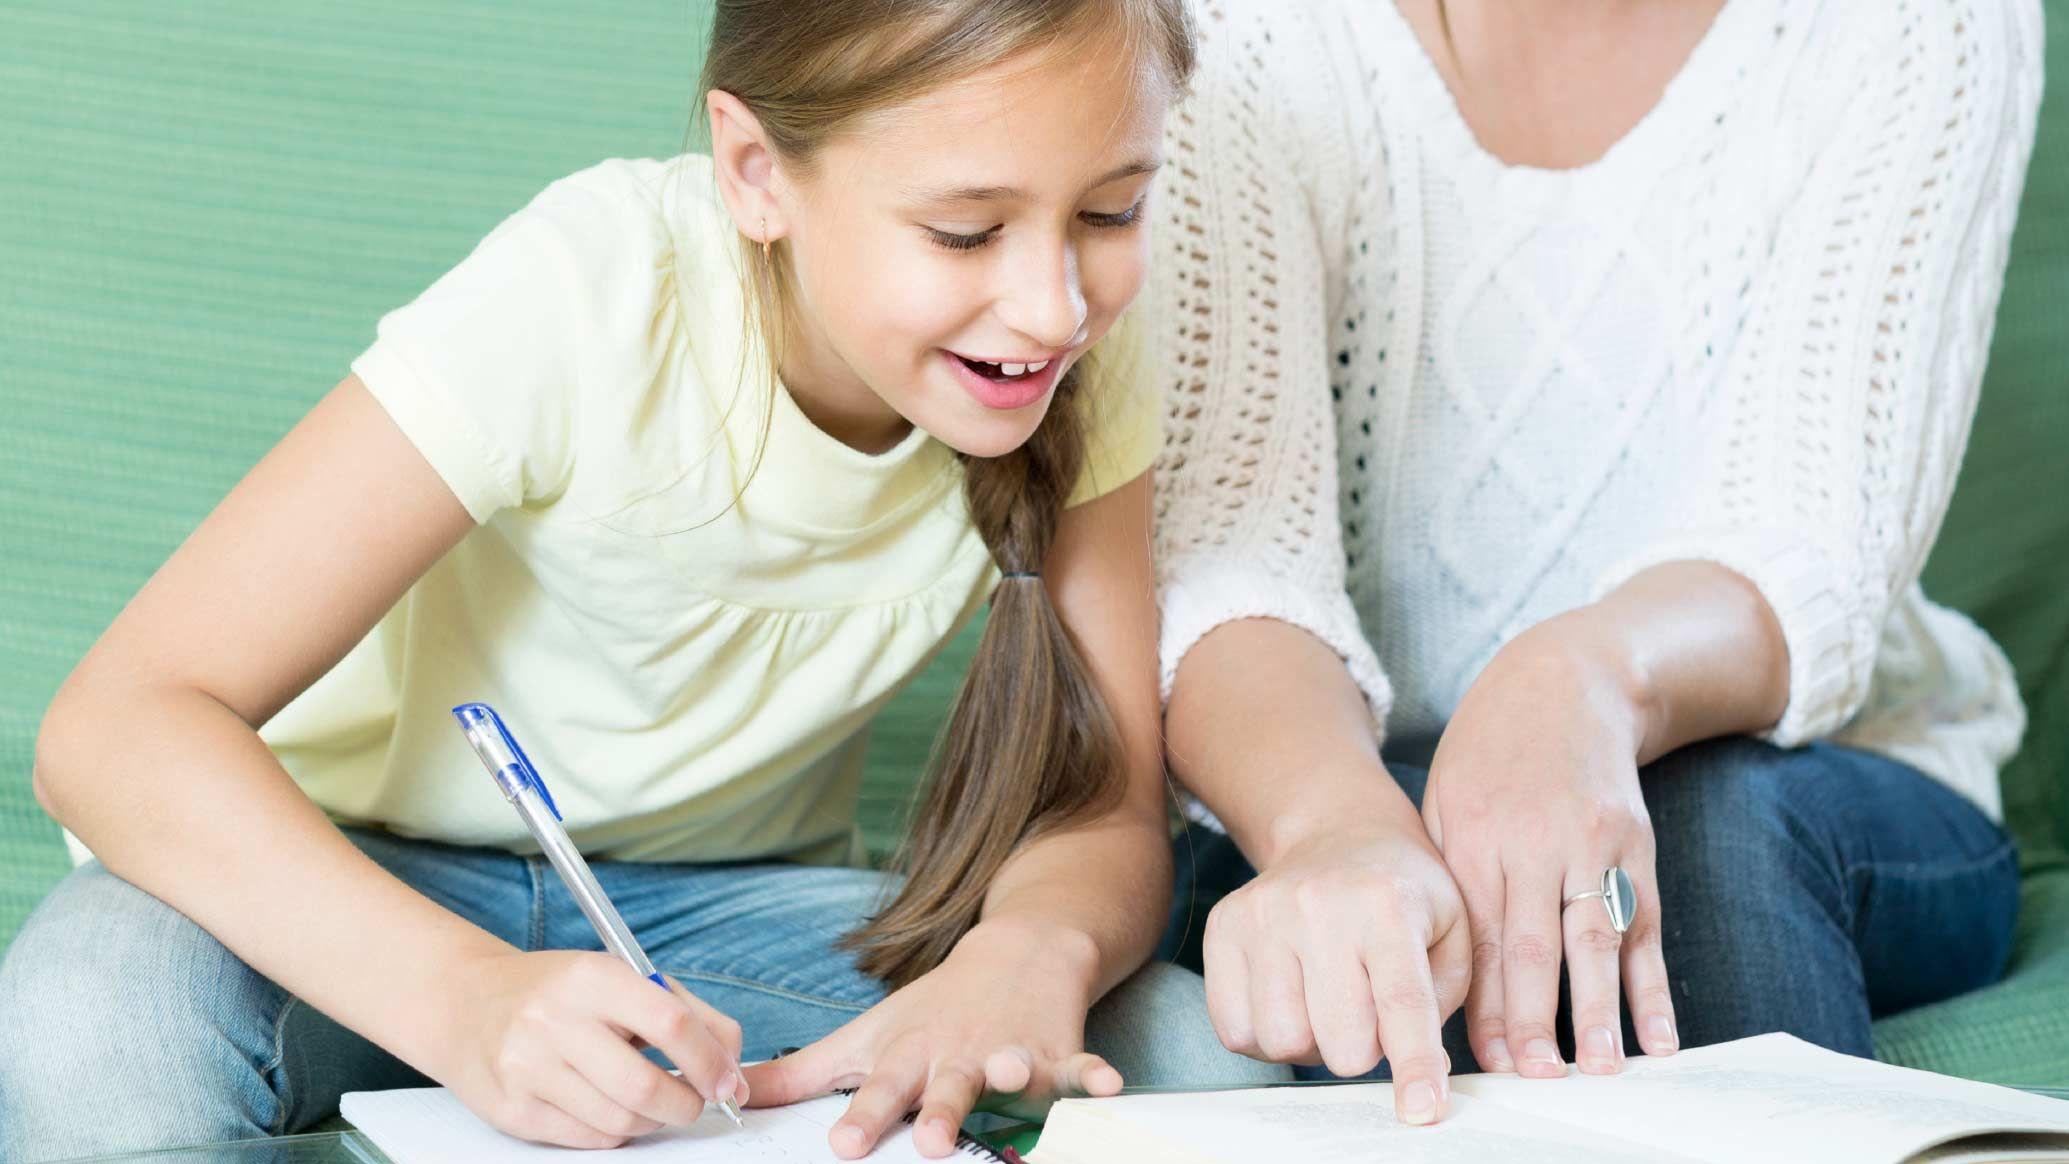 Does homework help improve grades